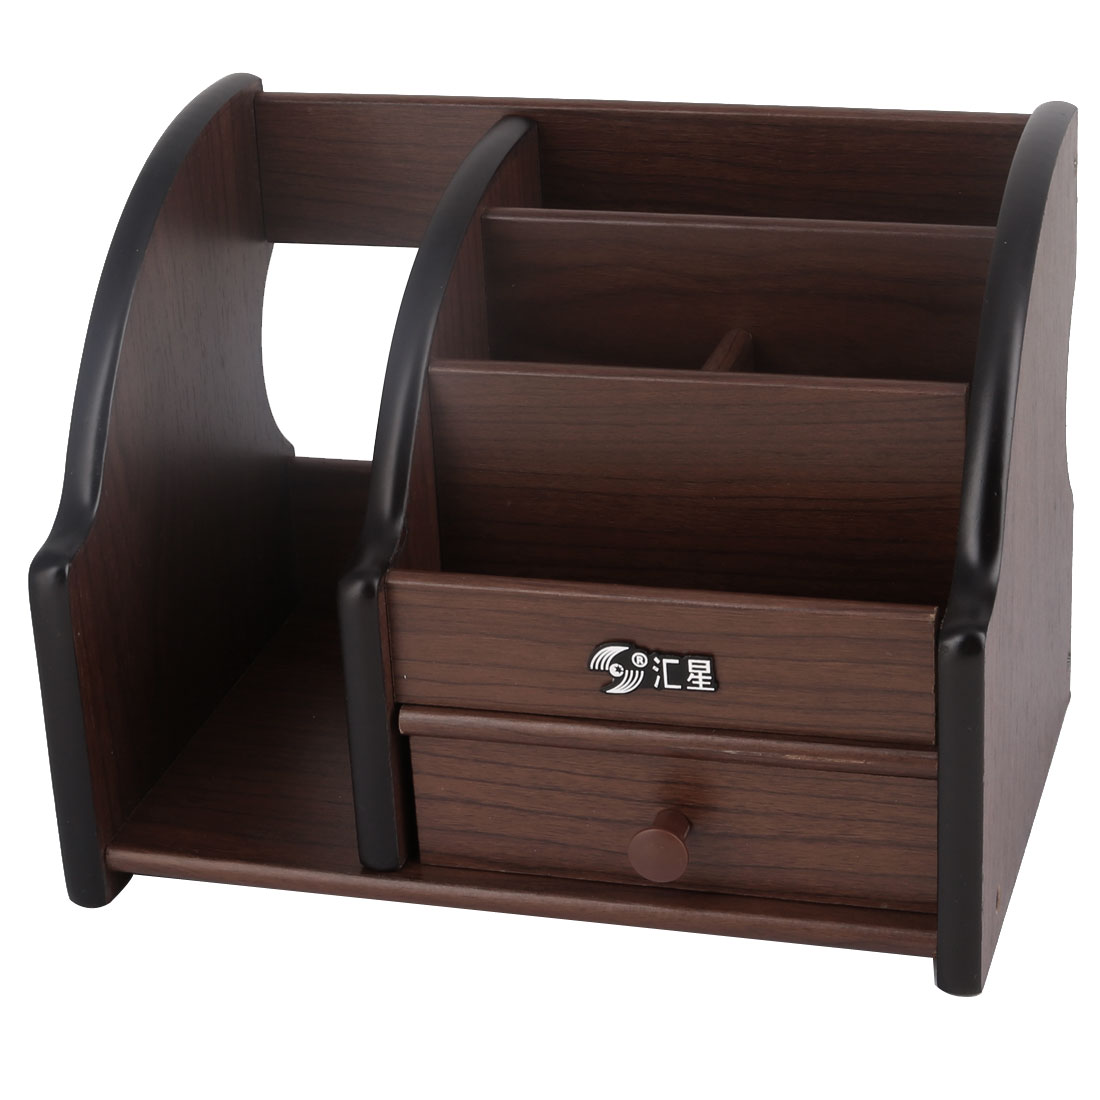 Desktop Wooden Storage Remote Control Cosmetic Pen Holder Box Case